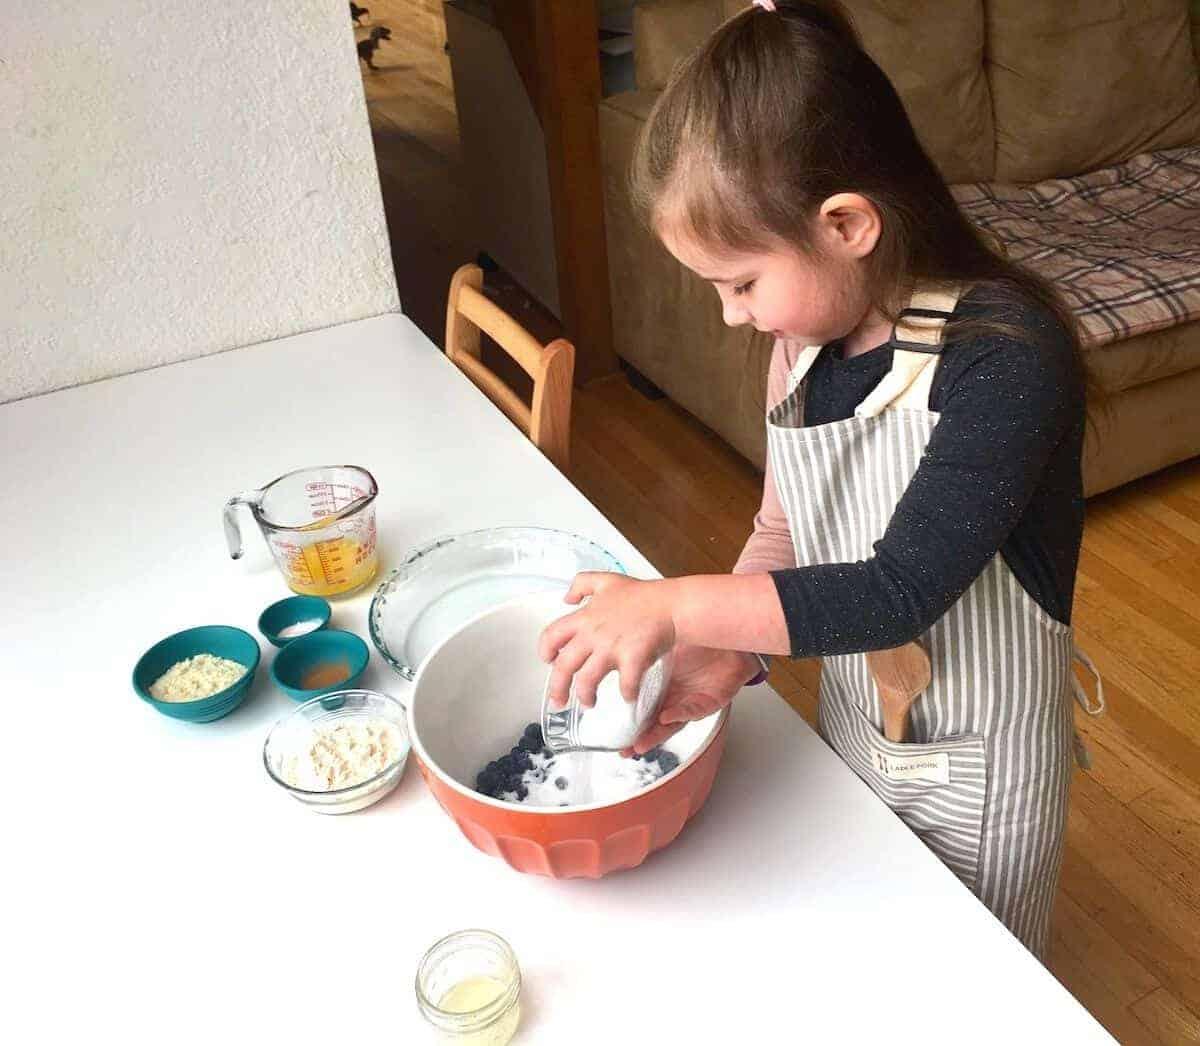 Montessori Practical Life in the Kitchen:  Baking Blueberry Cake